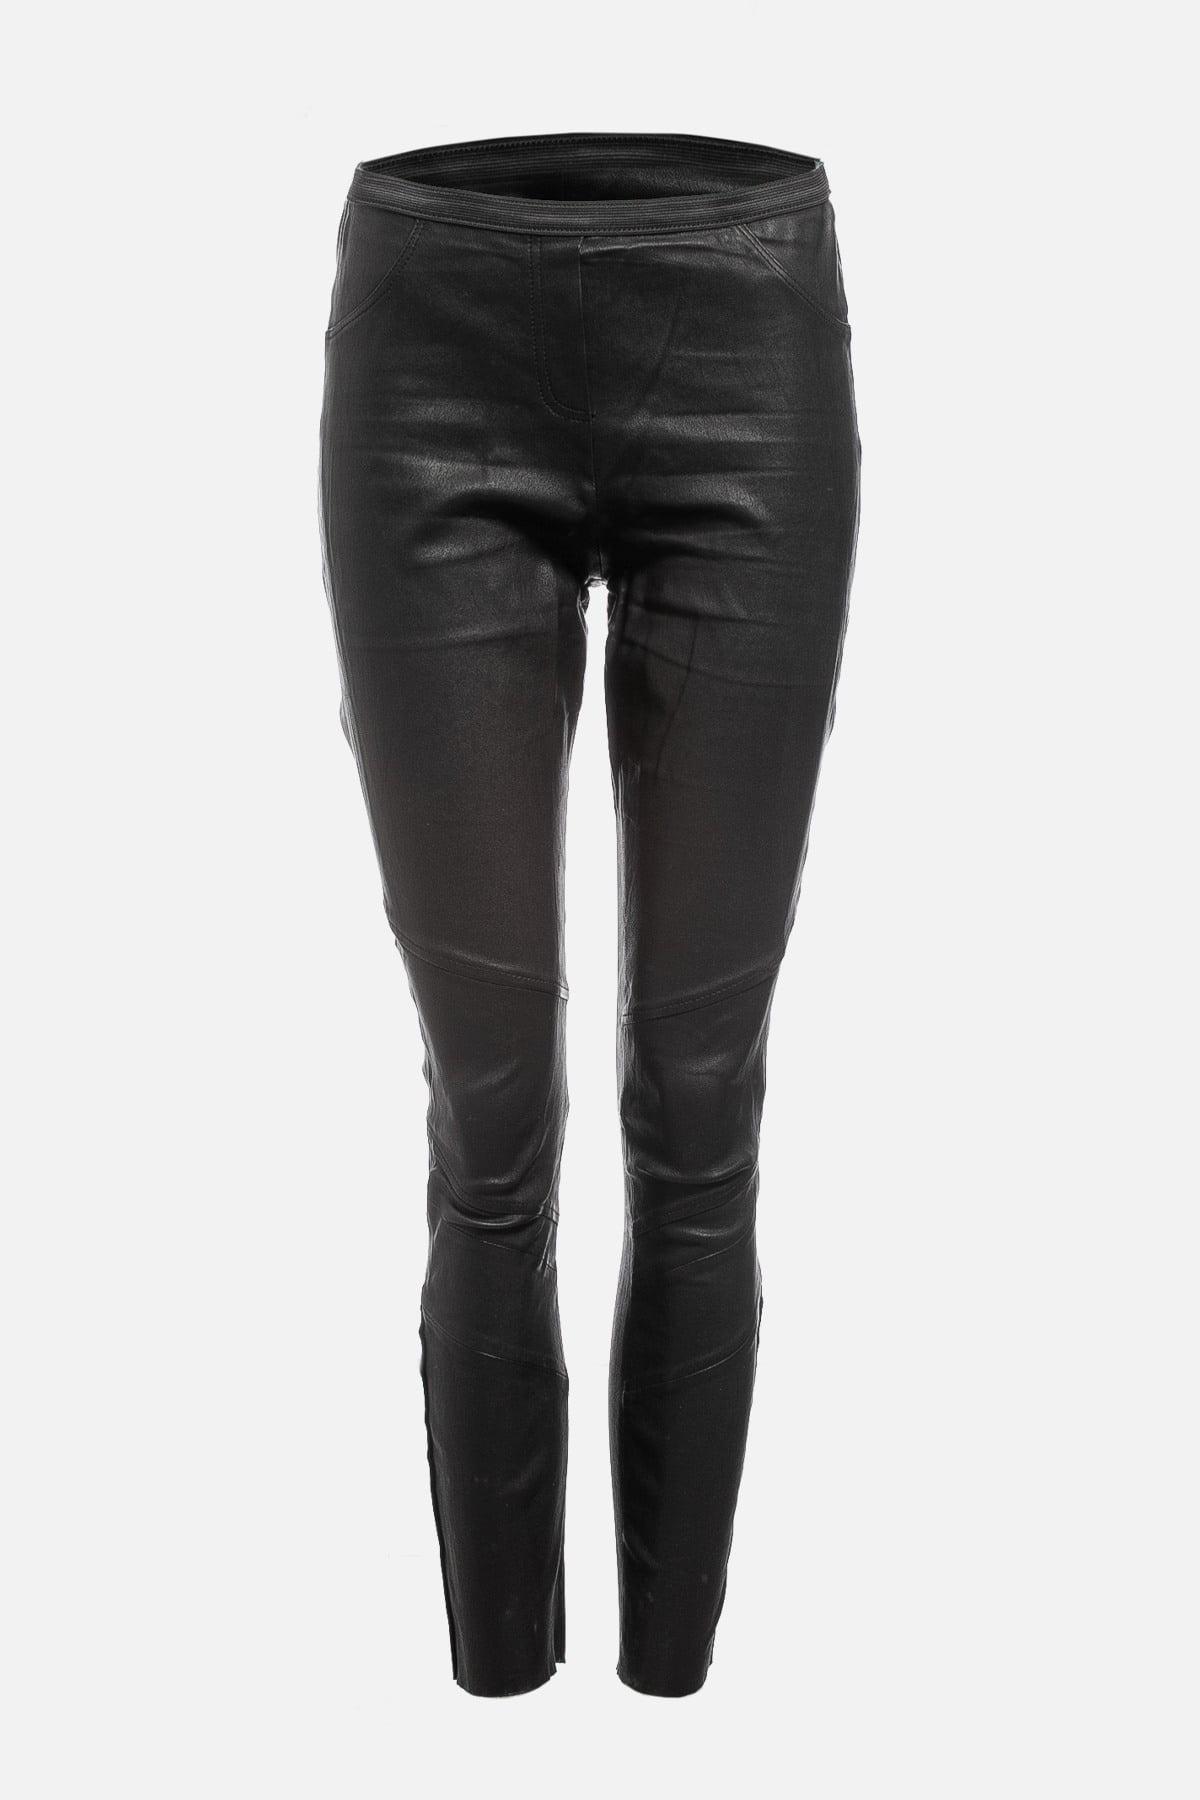 Lamb Leather Skinny Leg Pants